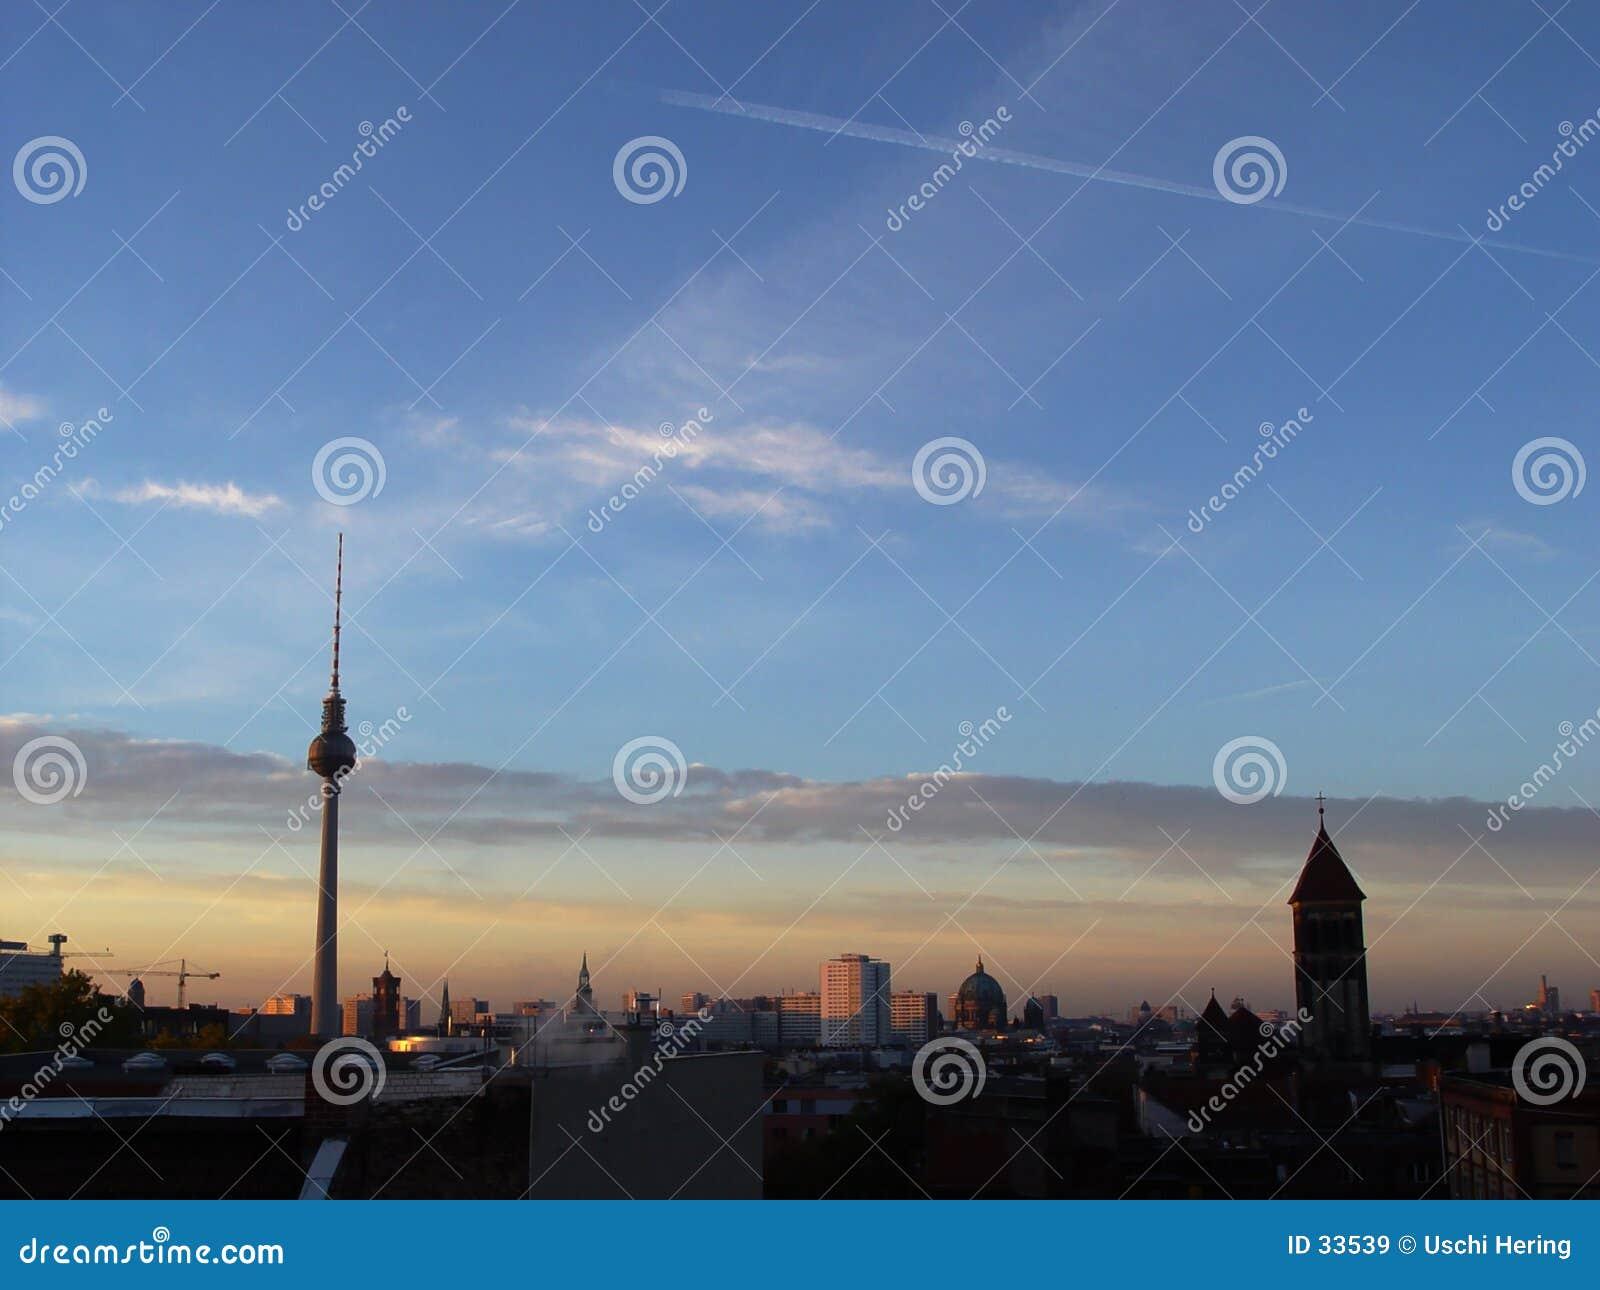 berlin awakening